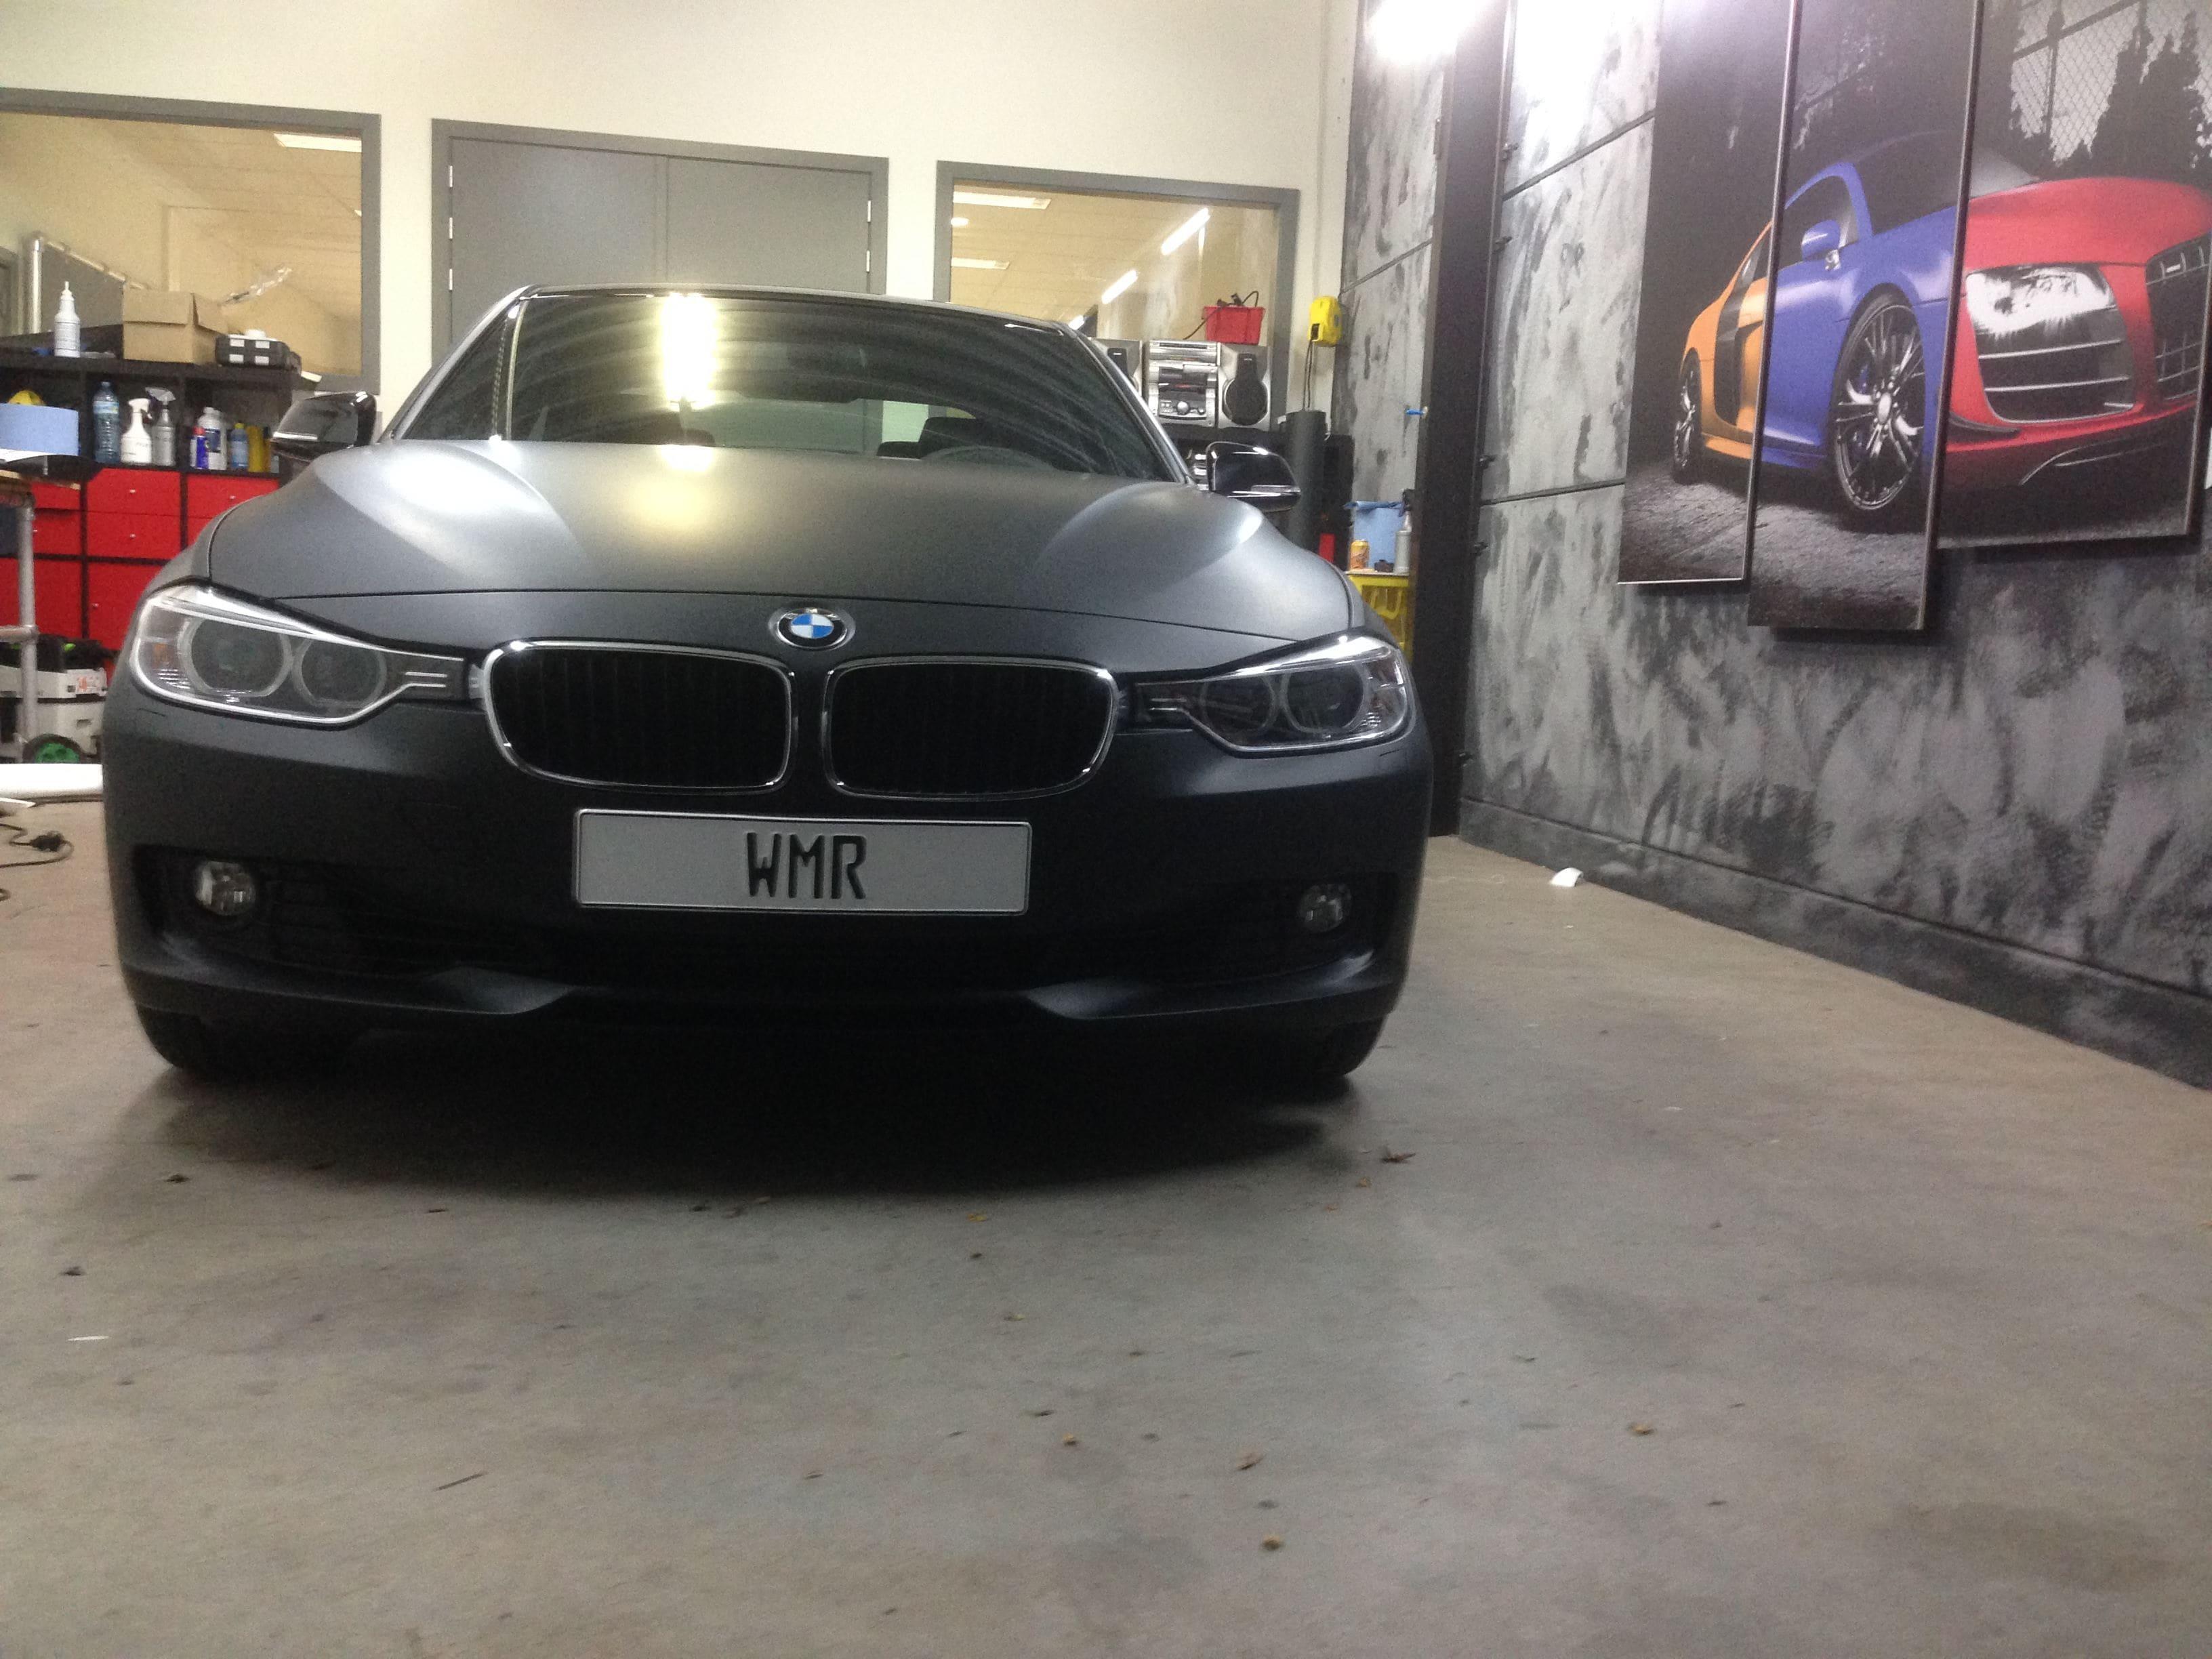 BMW E92 3 Serie met Mat Zwarte Wrap, Carwrapping door Wrapmyride.nu Foto-nr:5419, ©2020